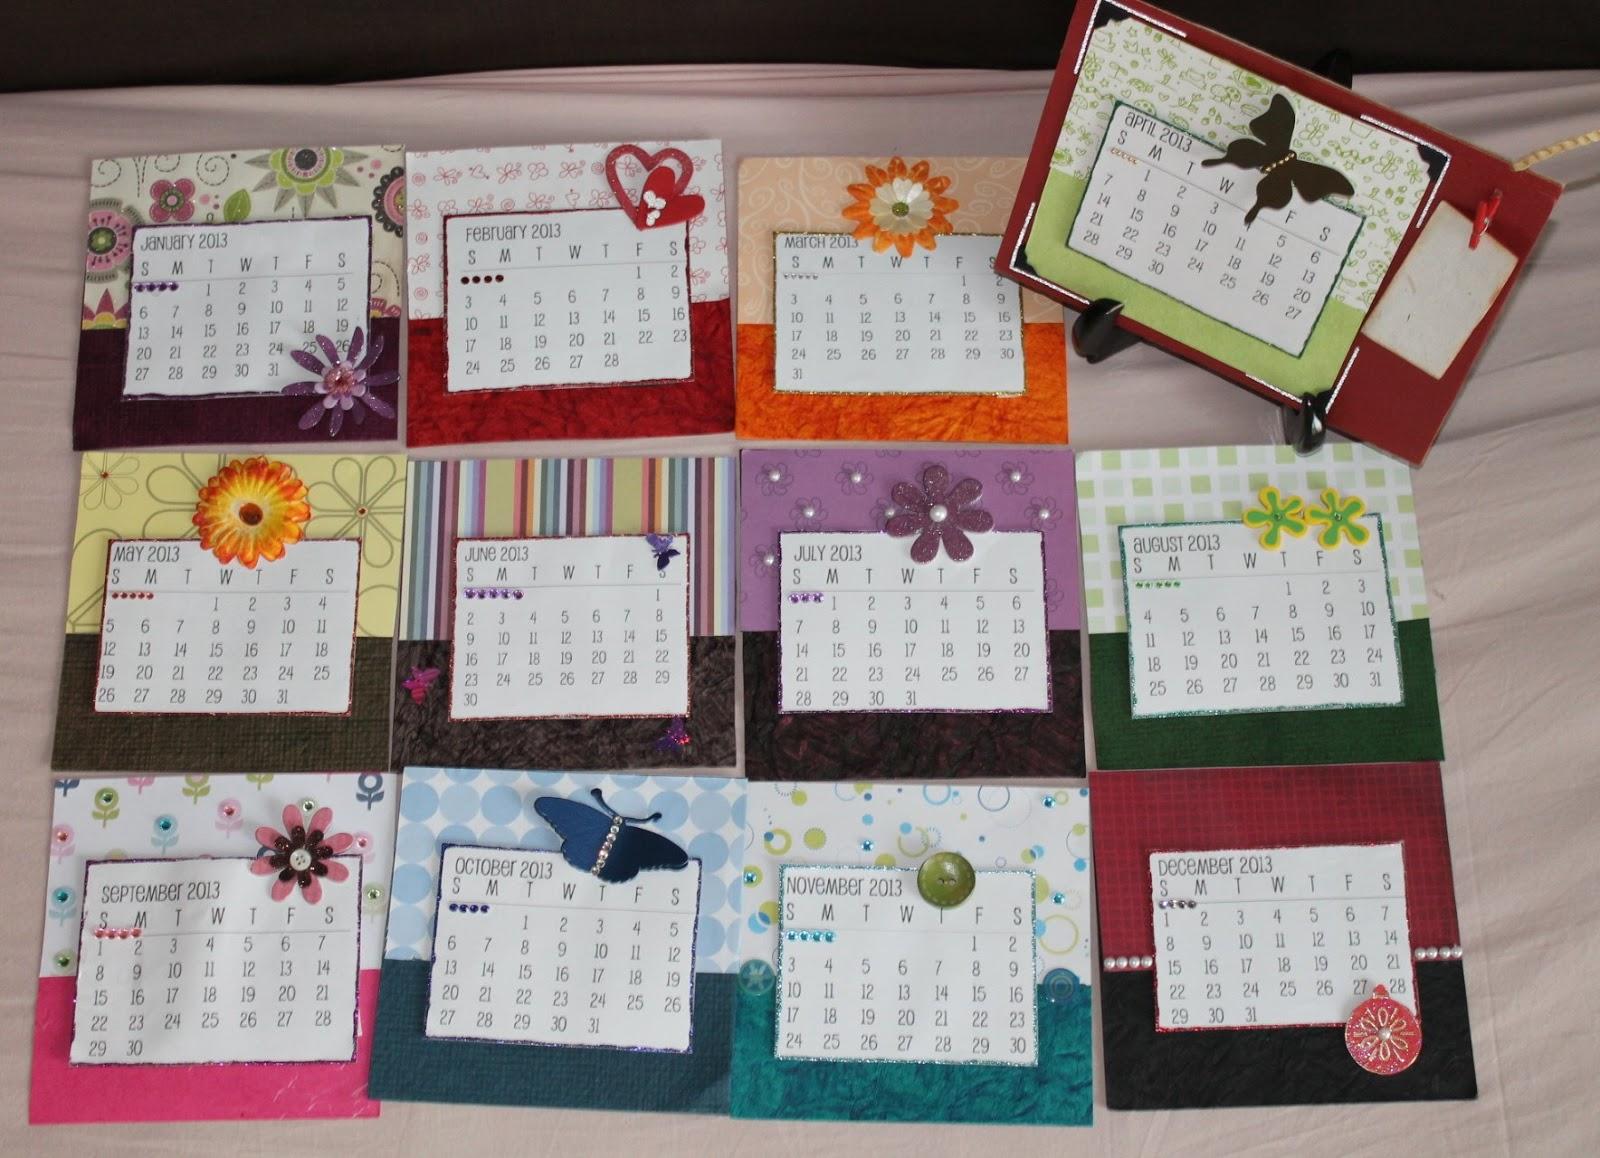 Handmade Calendar Designs : Handmade calendars ideas images diy calendar wood